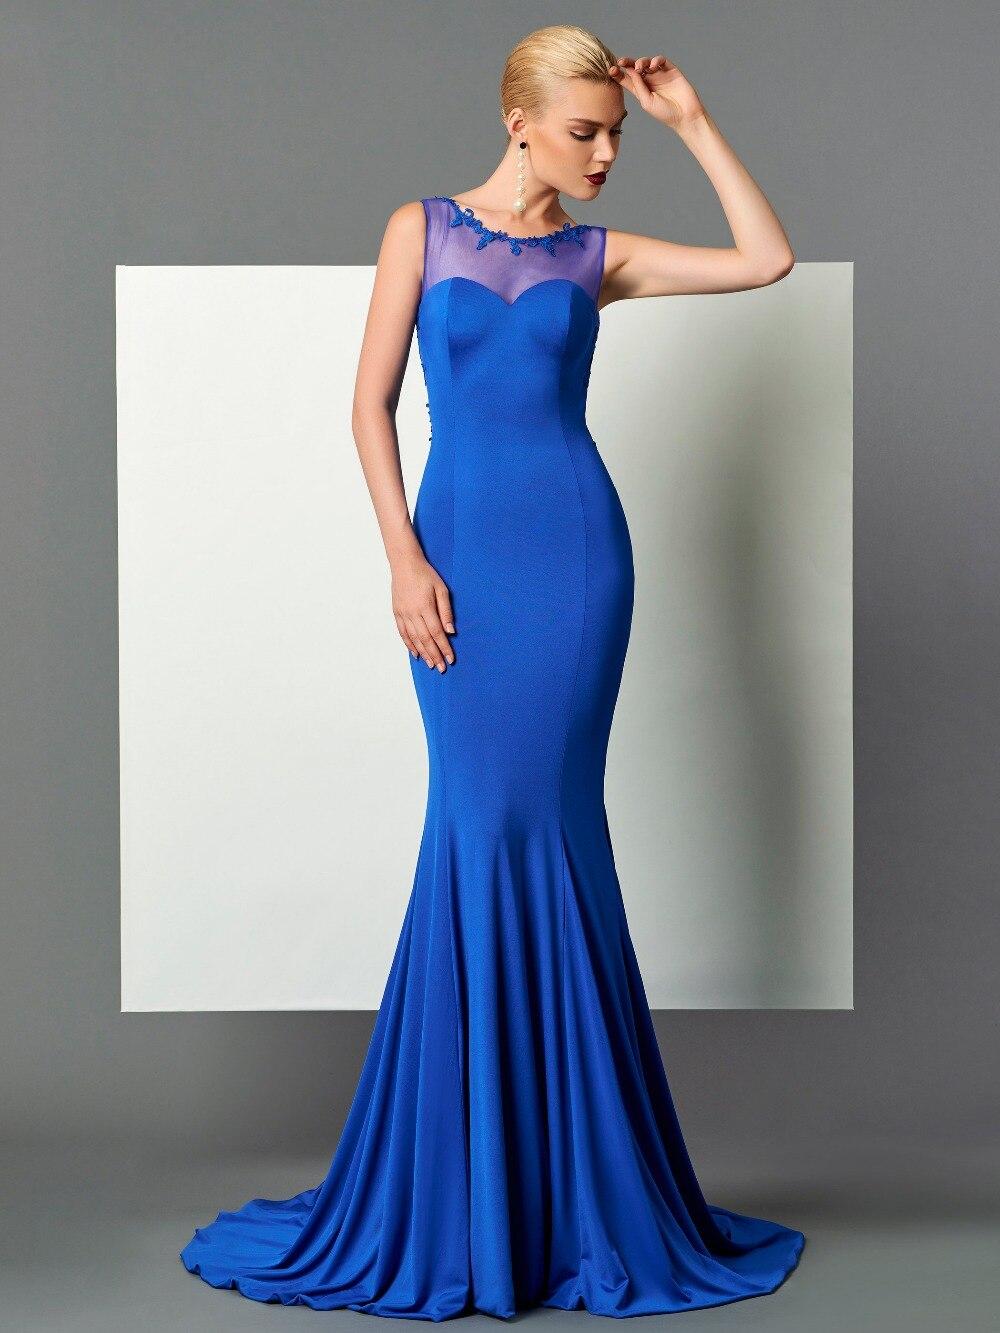 Sexy Blue Spandex Evening   Dresses   Long   Prom     Dresses   Evening Party   Dress   with Appliques robe de soiree vestido longo